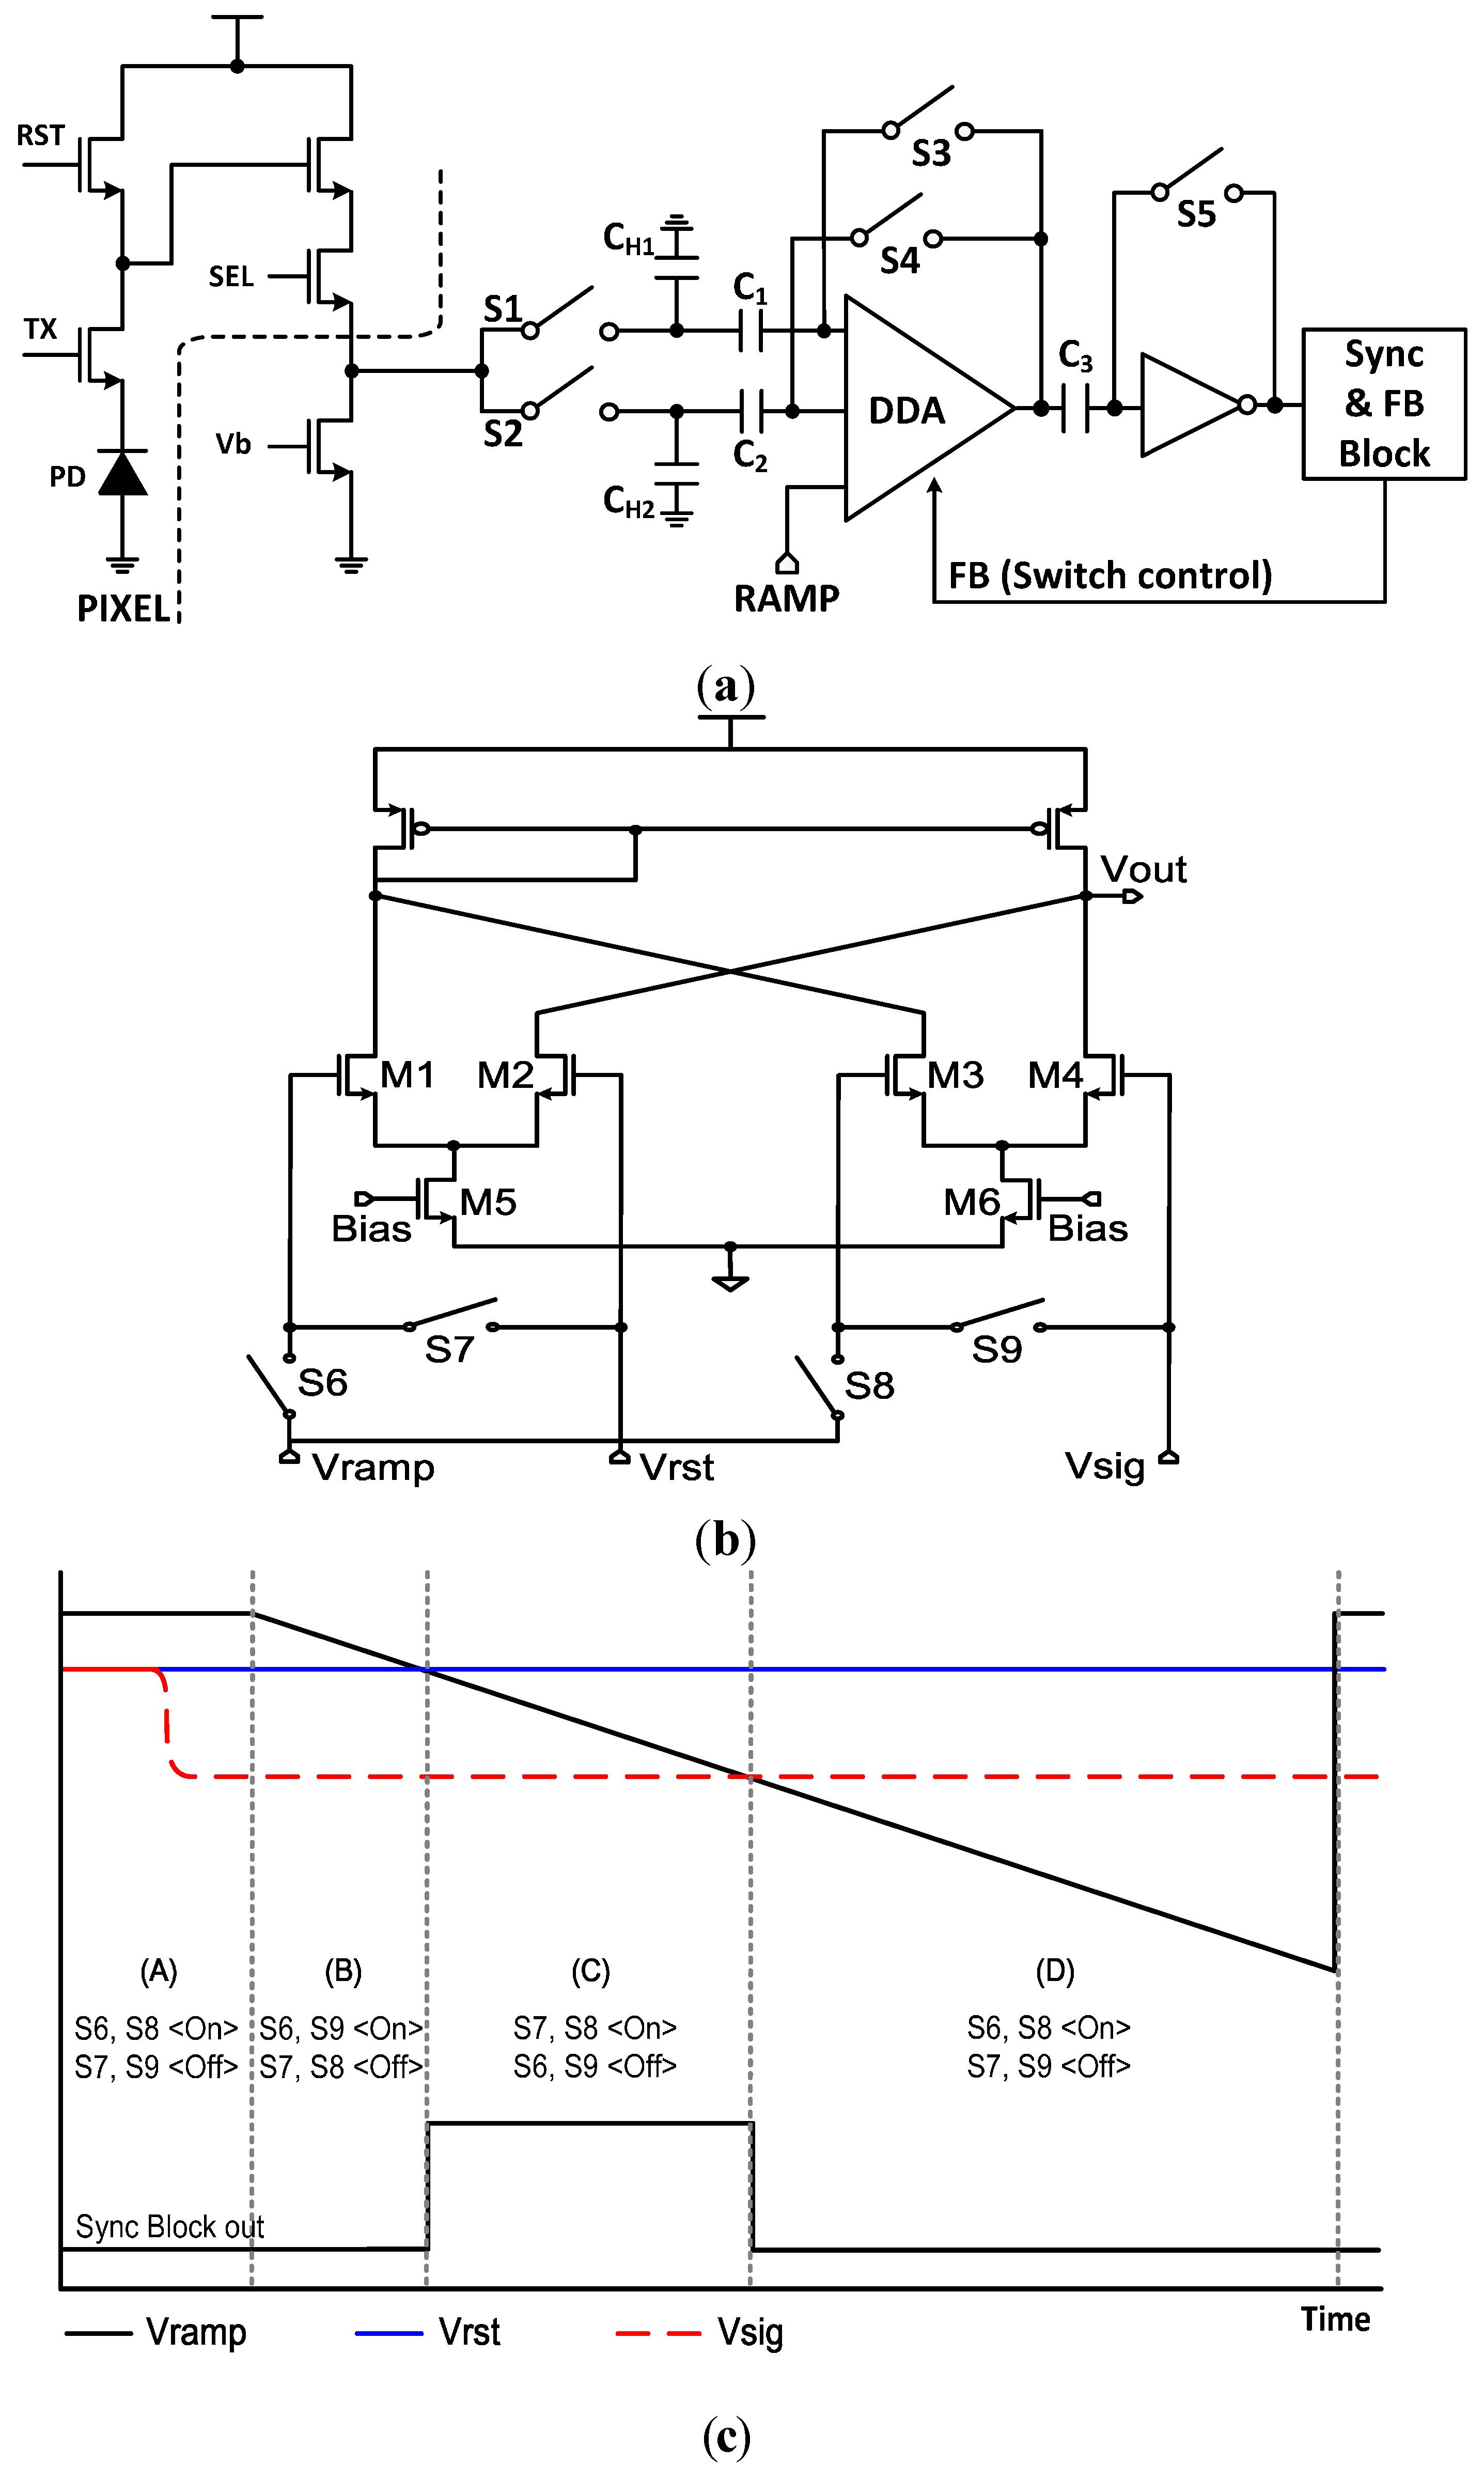 Sensors Free Full Text A High Speed Cmos Image Sensor With Digital To Analog Converter Circuit Diagram Furthermore 8 Bit 15 05081 G003 1024